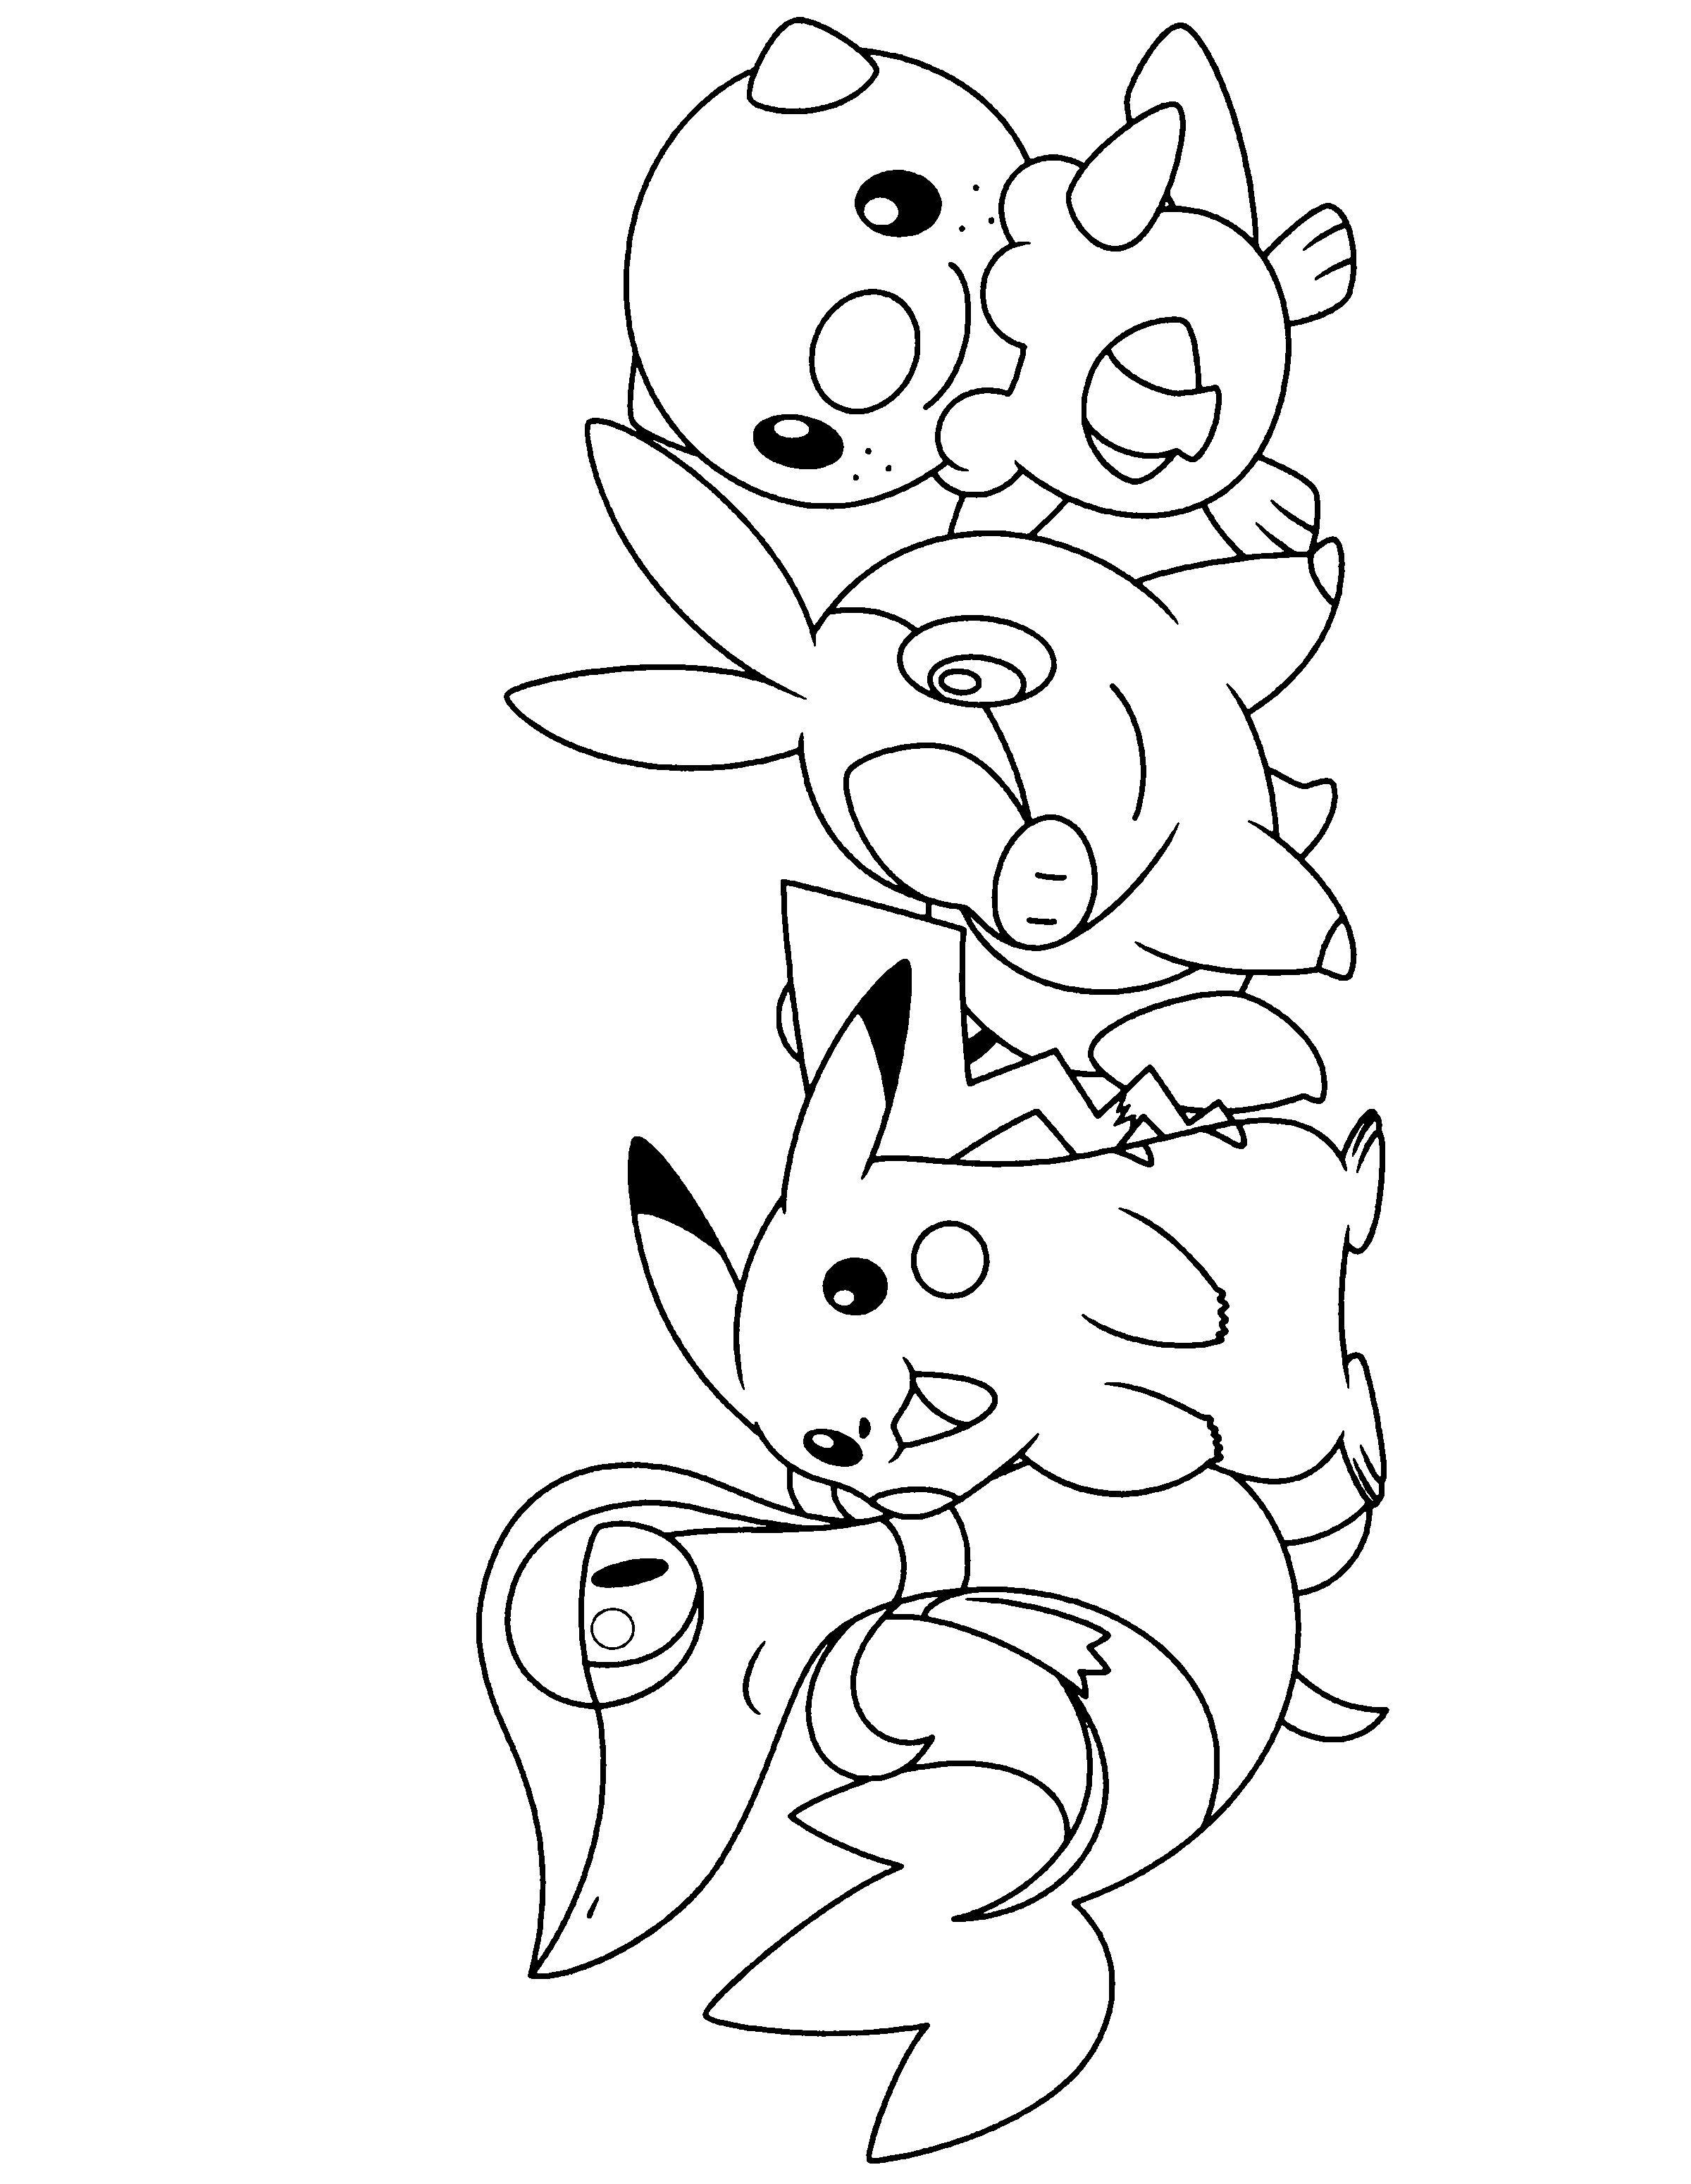 Coloring Pokemon Black And White Pokemon Coloring Pages Pokemon